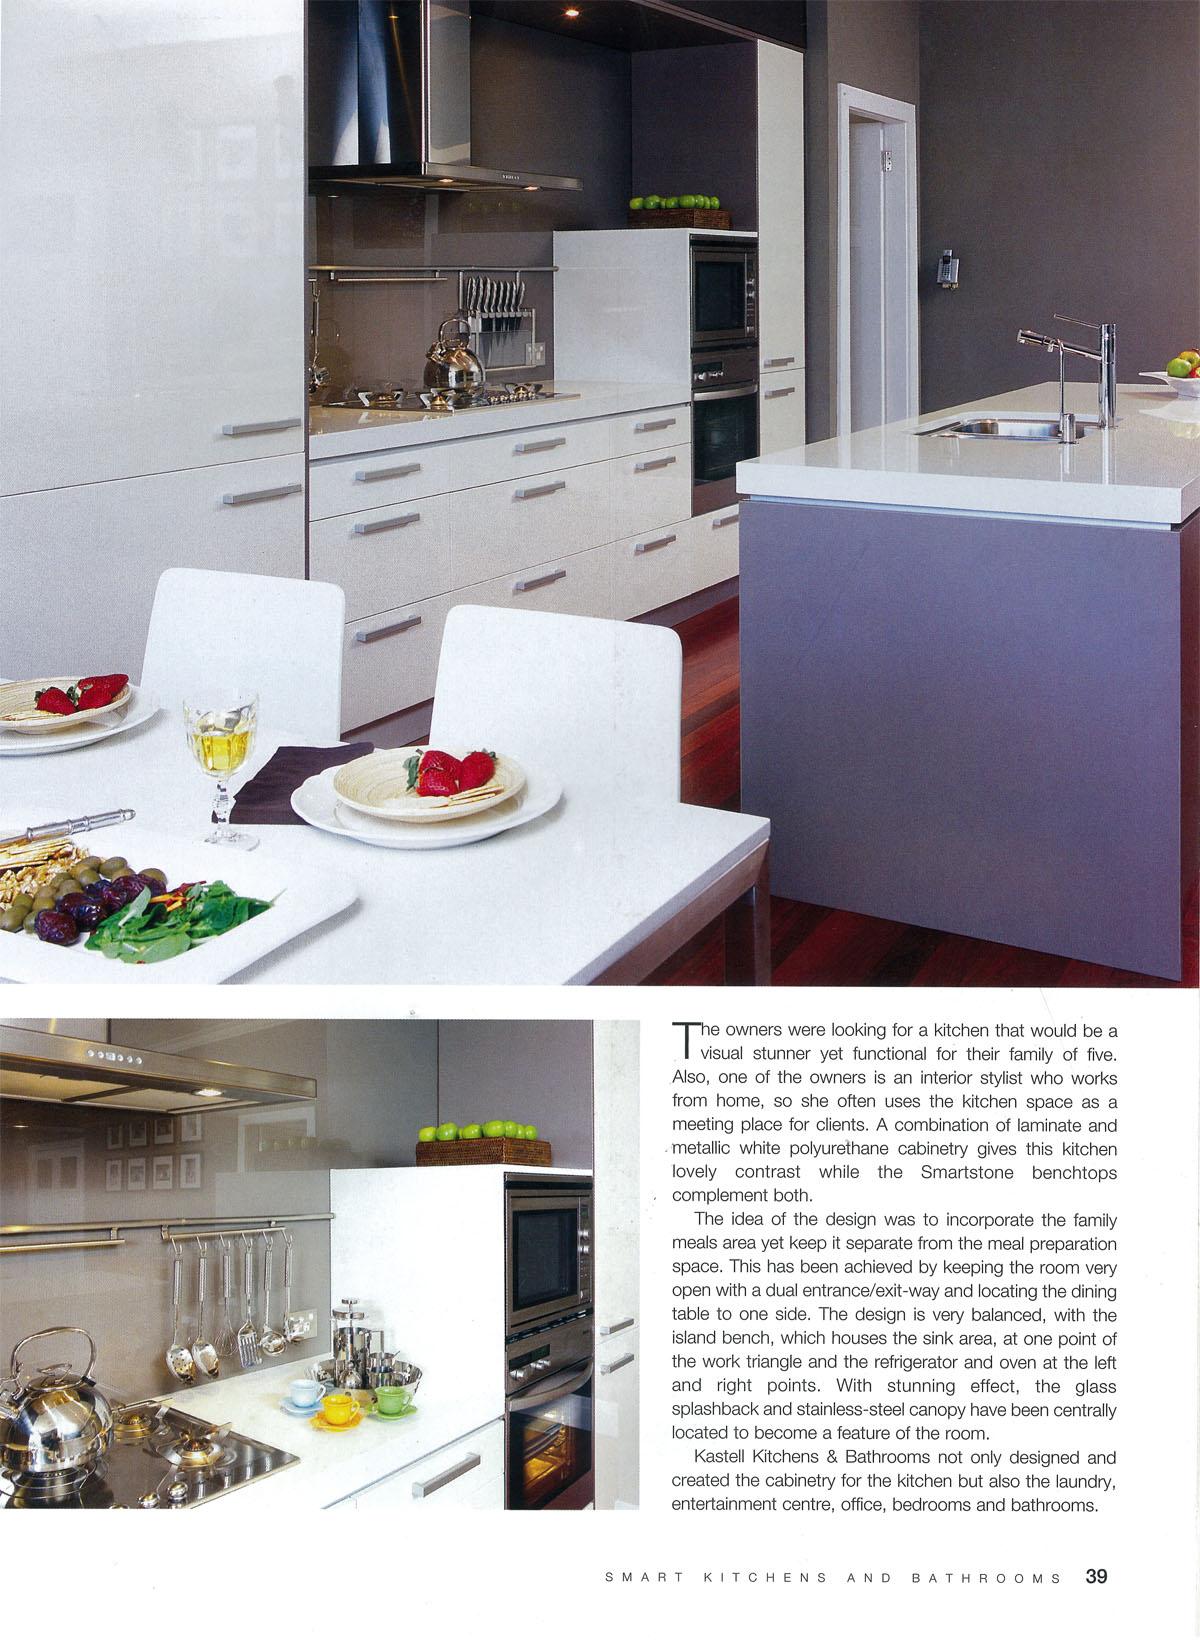 Lynne Bradley Interiors featured in Smart Kitchens & Bathrooms